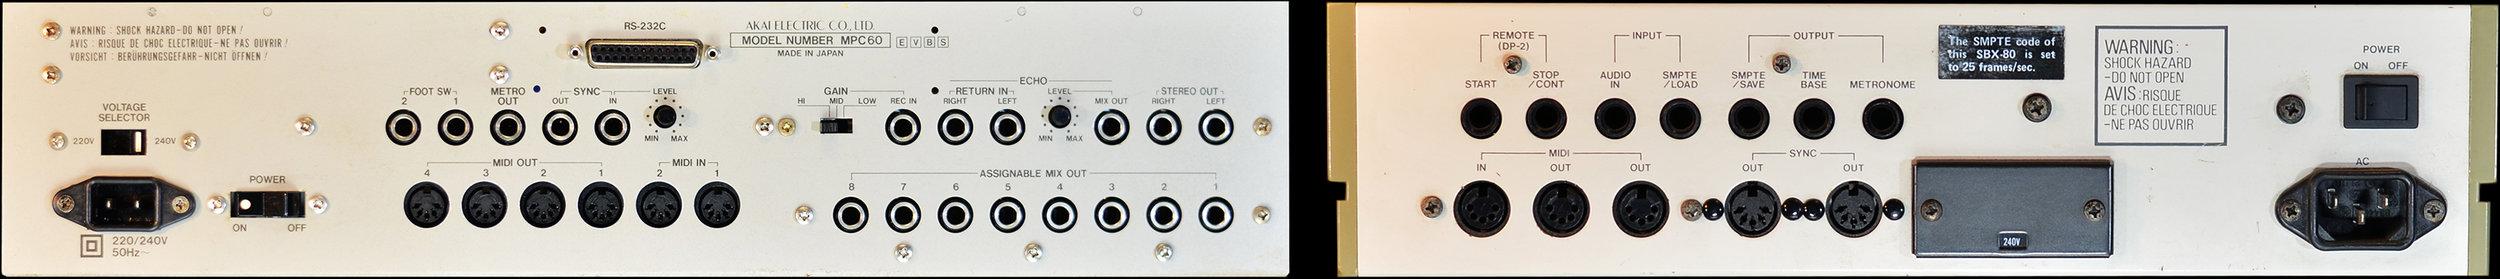 MPC-60 SBX80.jpg